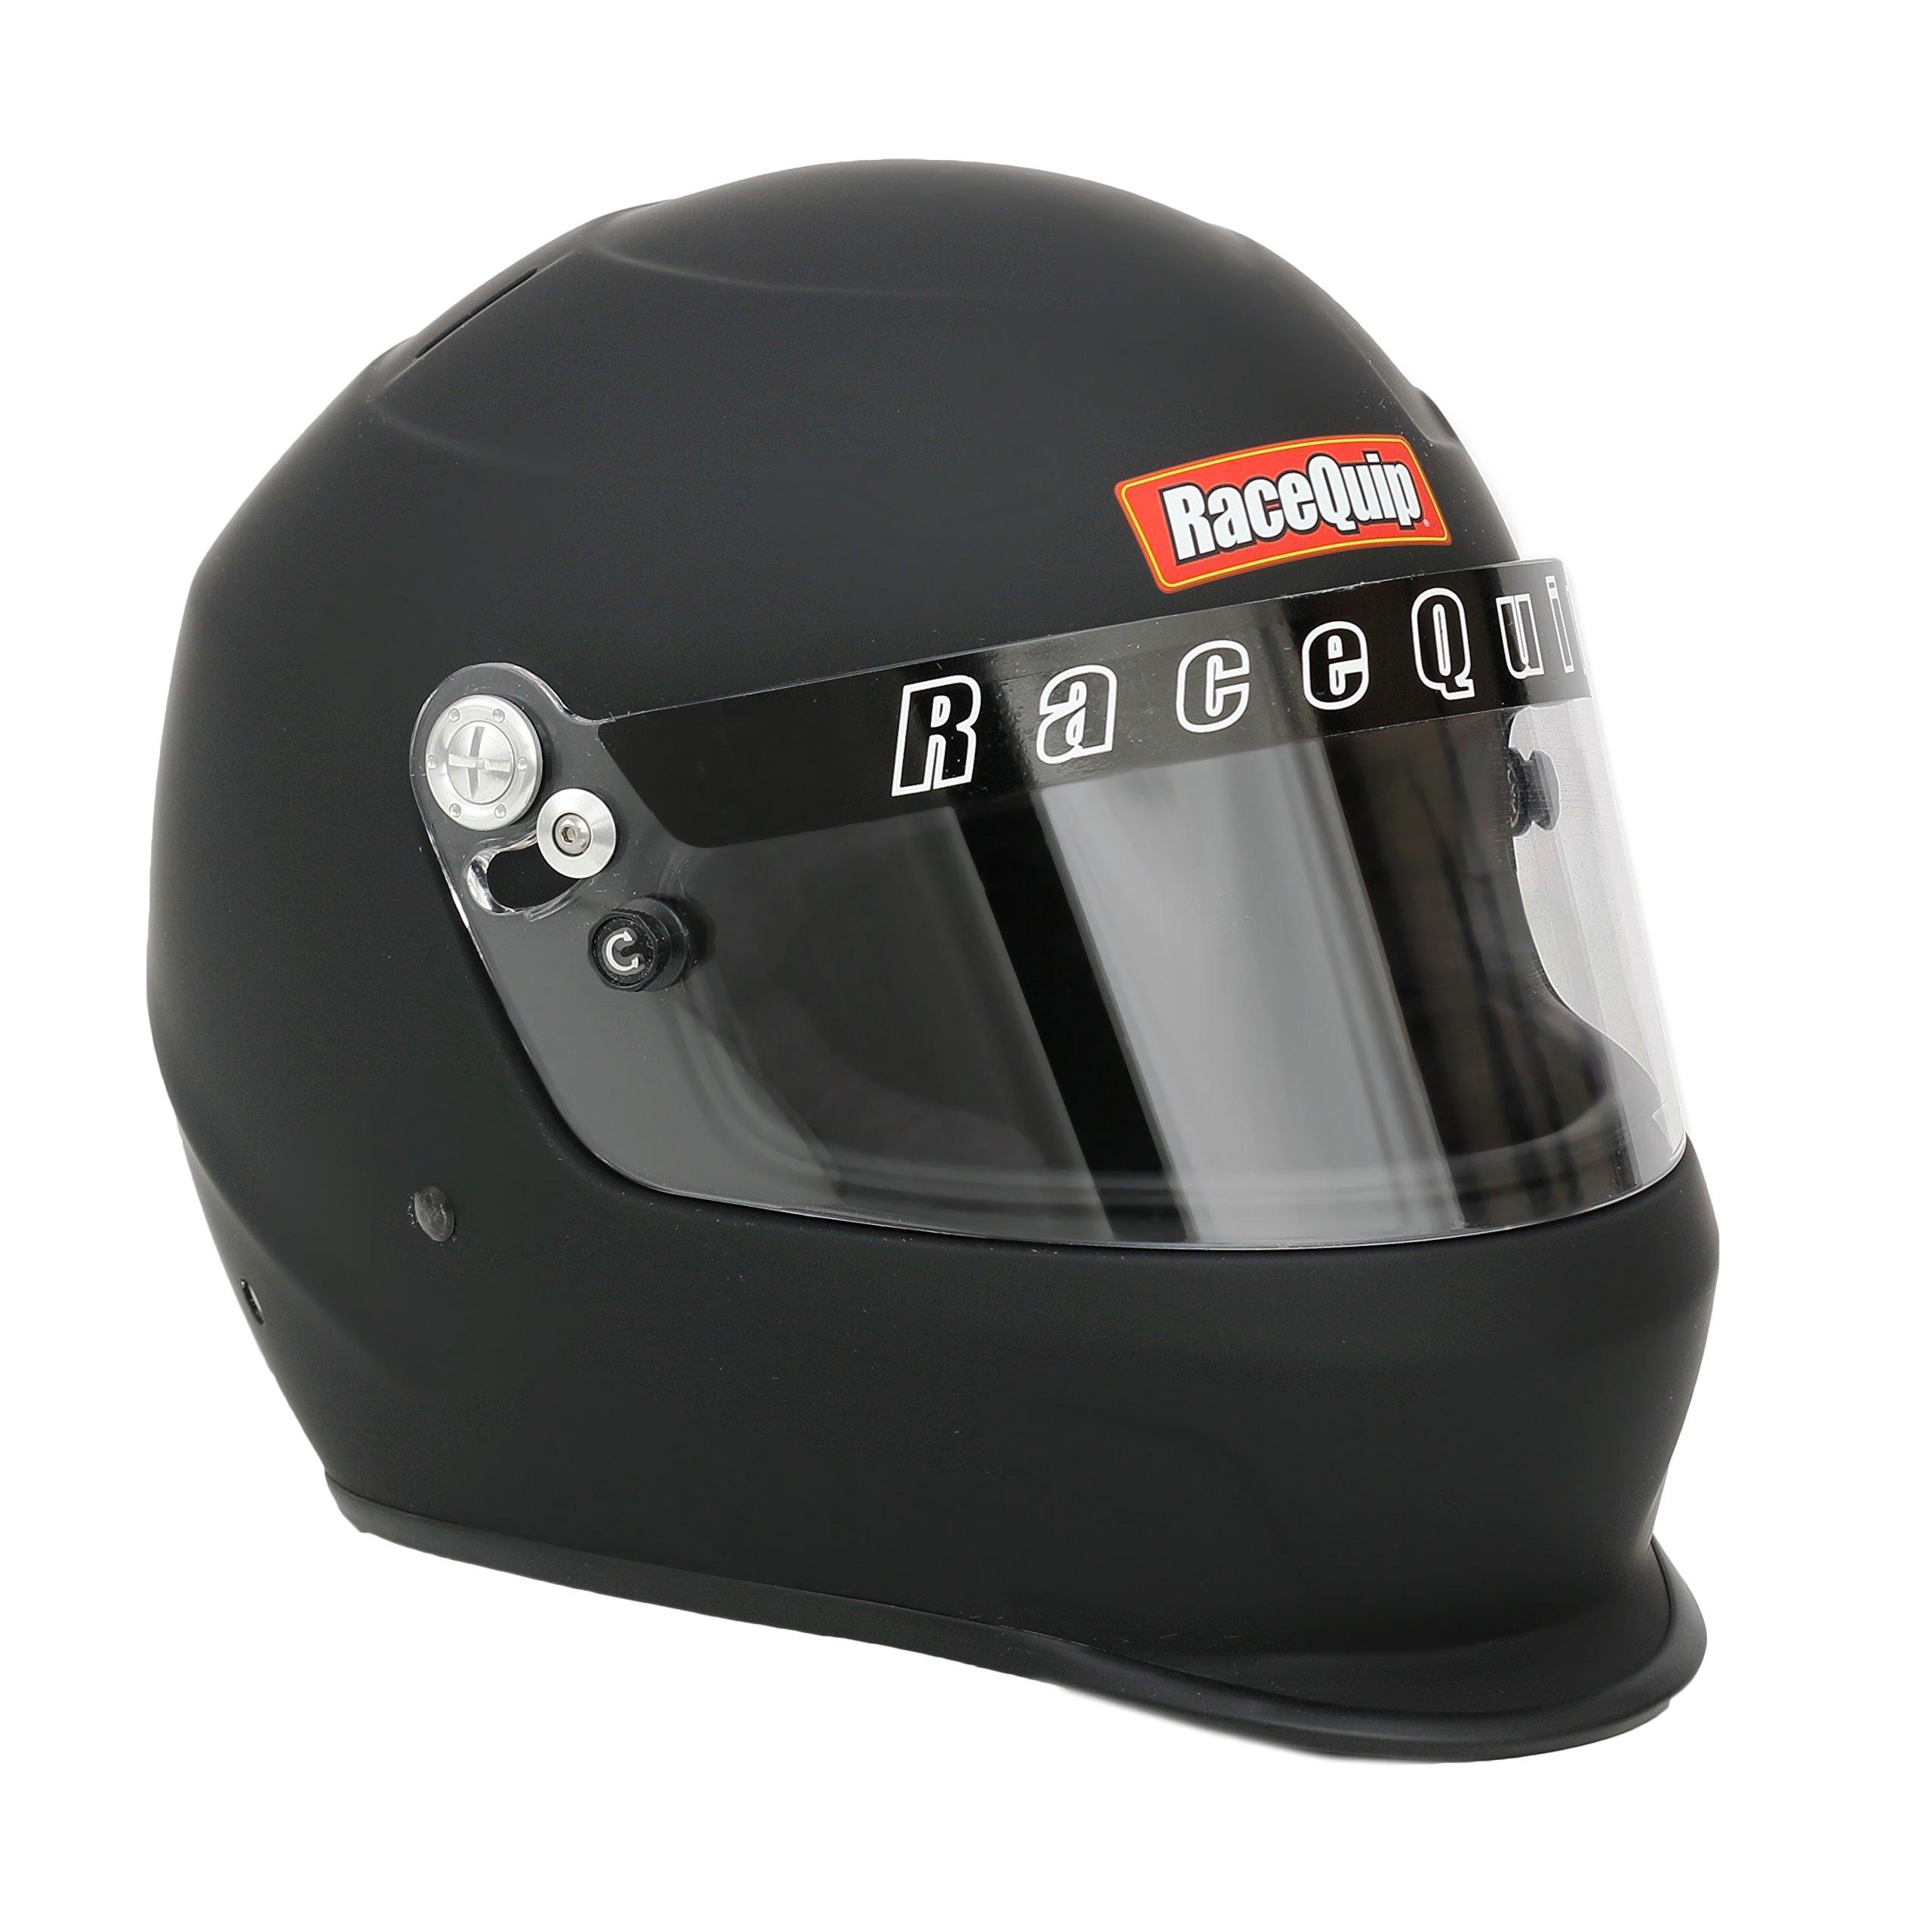 RaceQuip 2239993 Pro Kids Full-Face Model Youth/Jr Auto Racing Helmet (Flat Black)